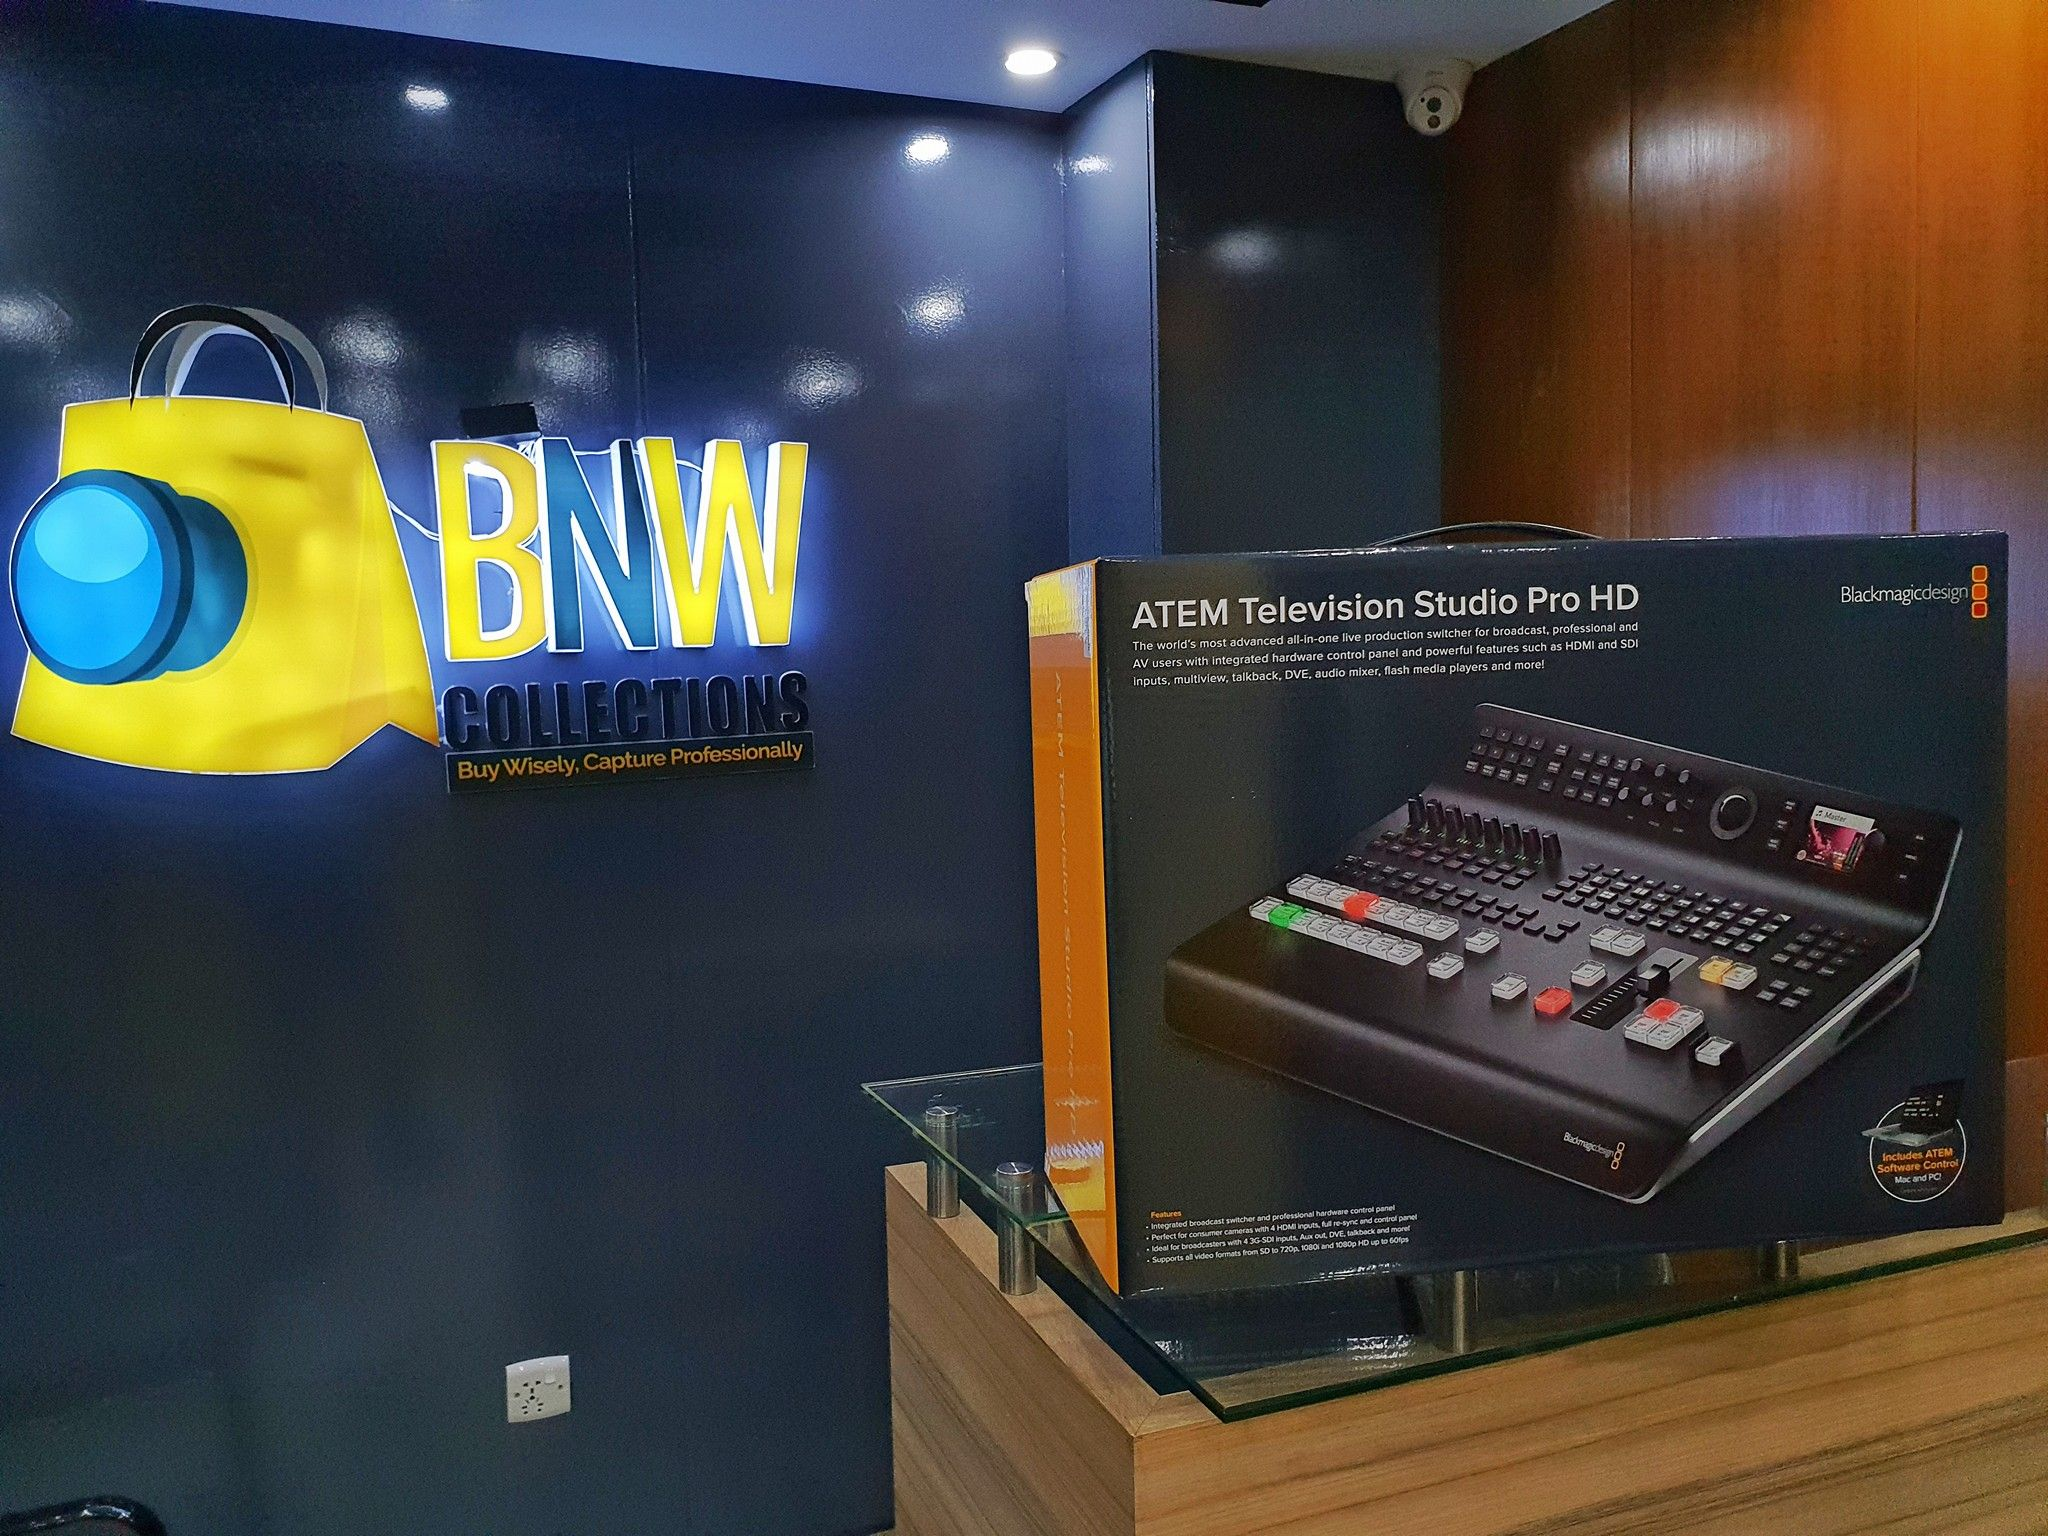 Blackmagic Design Atem Television Studio Pro Hd Live Production Switcher Highlights 8 Channel Sdi H Blackmagic Design Cameras And Accessories Photography Store